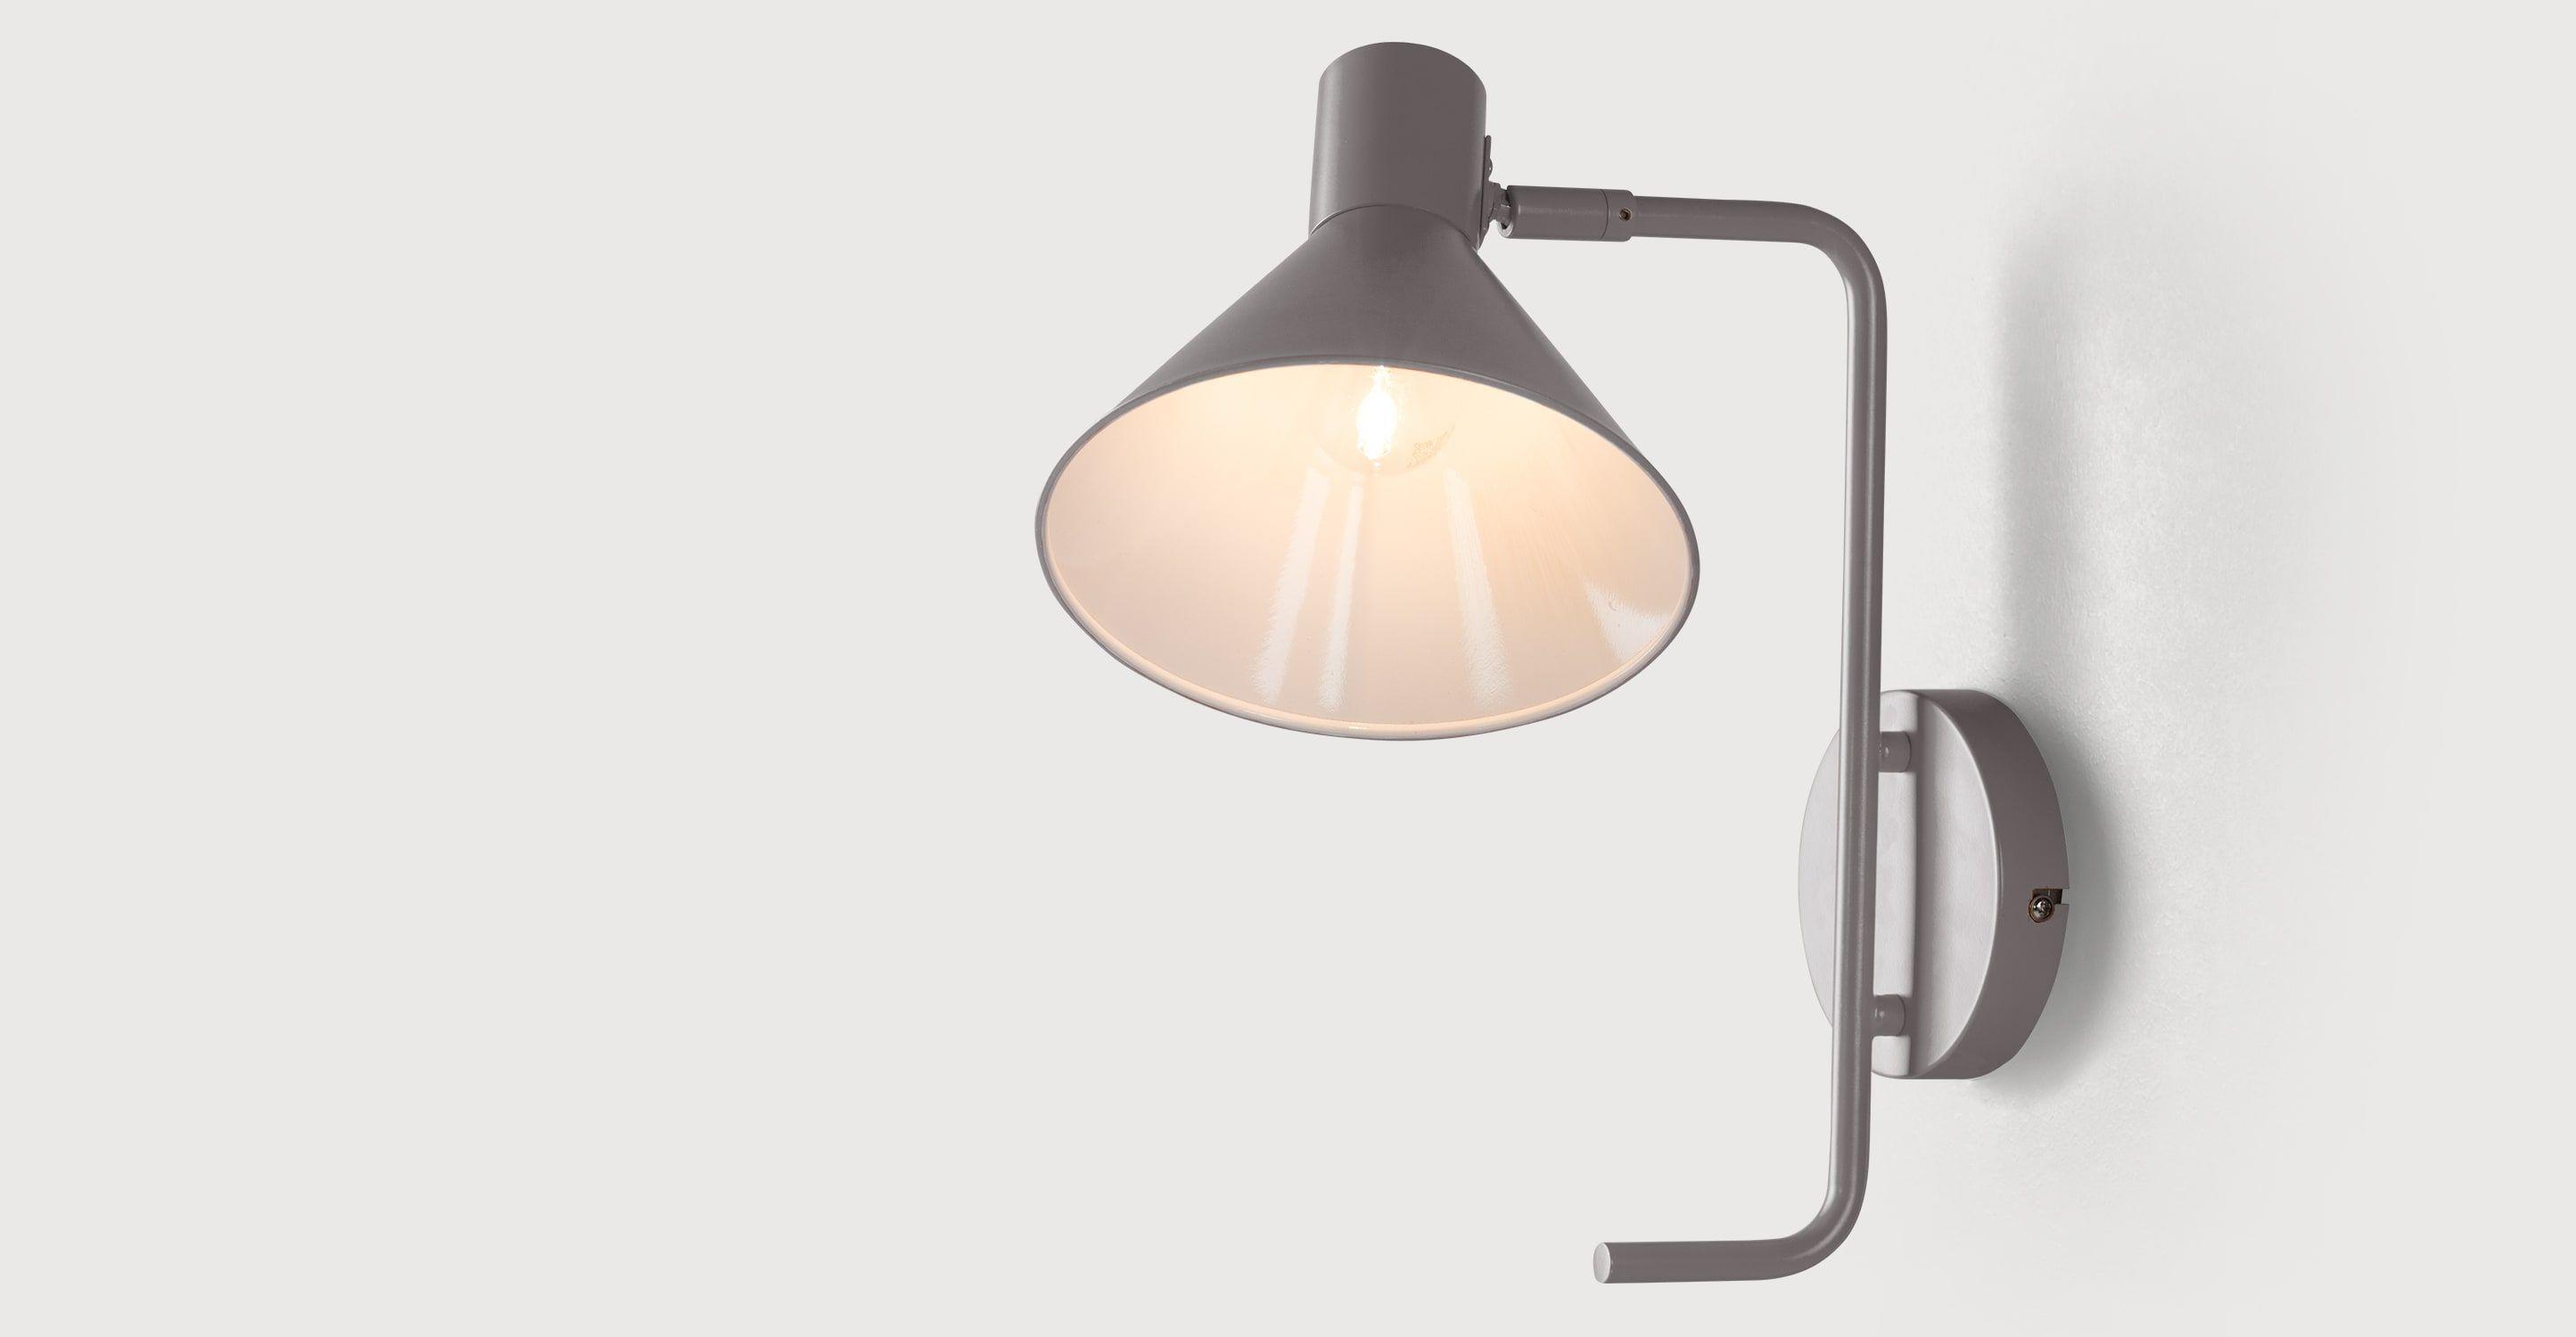 Pin by leonard Kinsella on HILTON HOSTEL | Wall lamp, Lamp